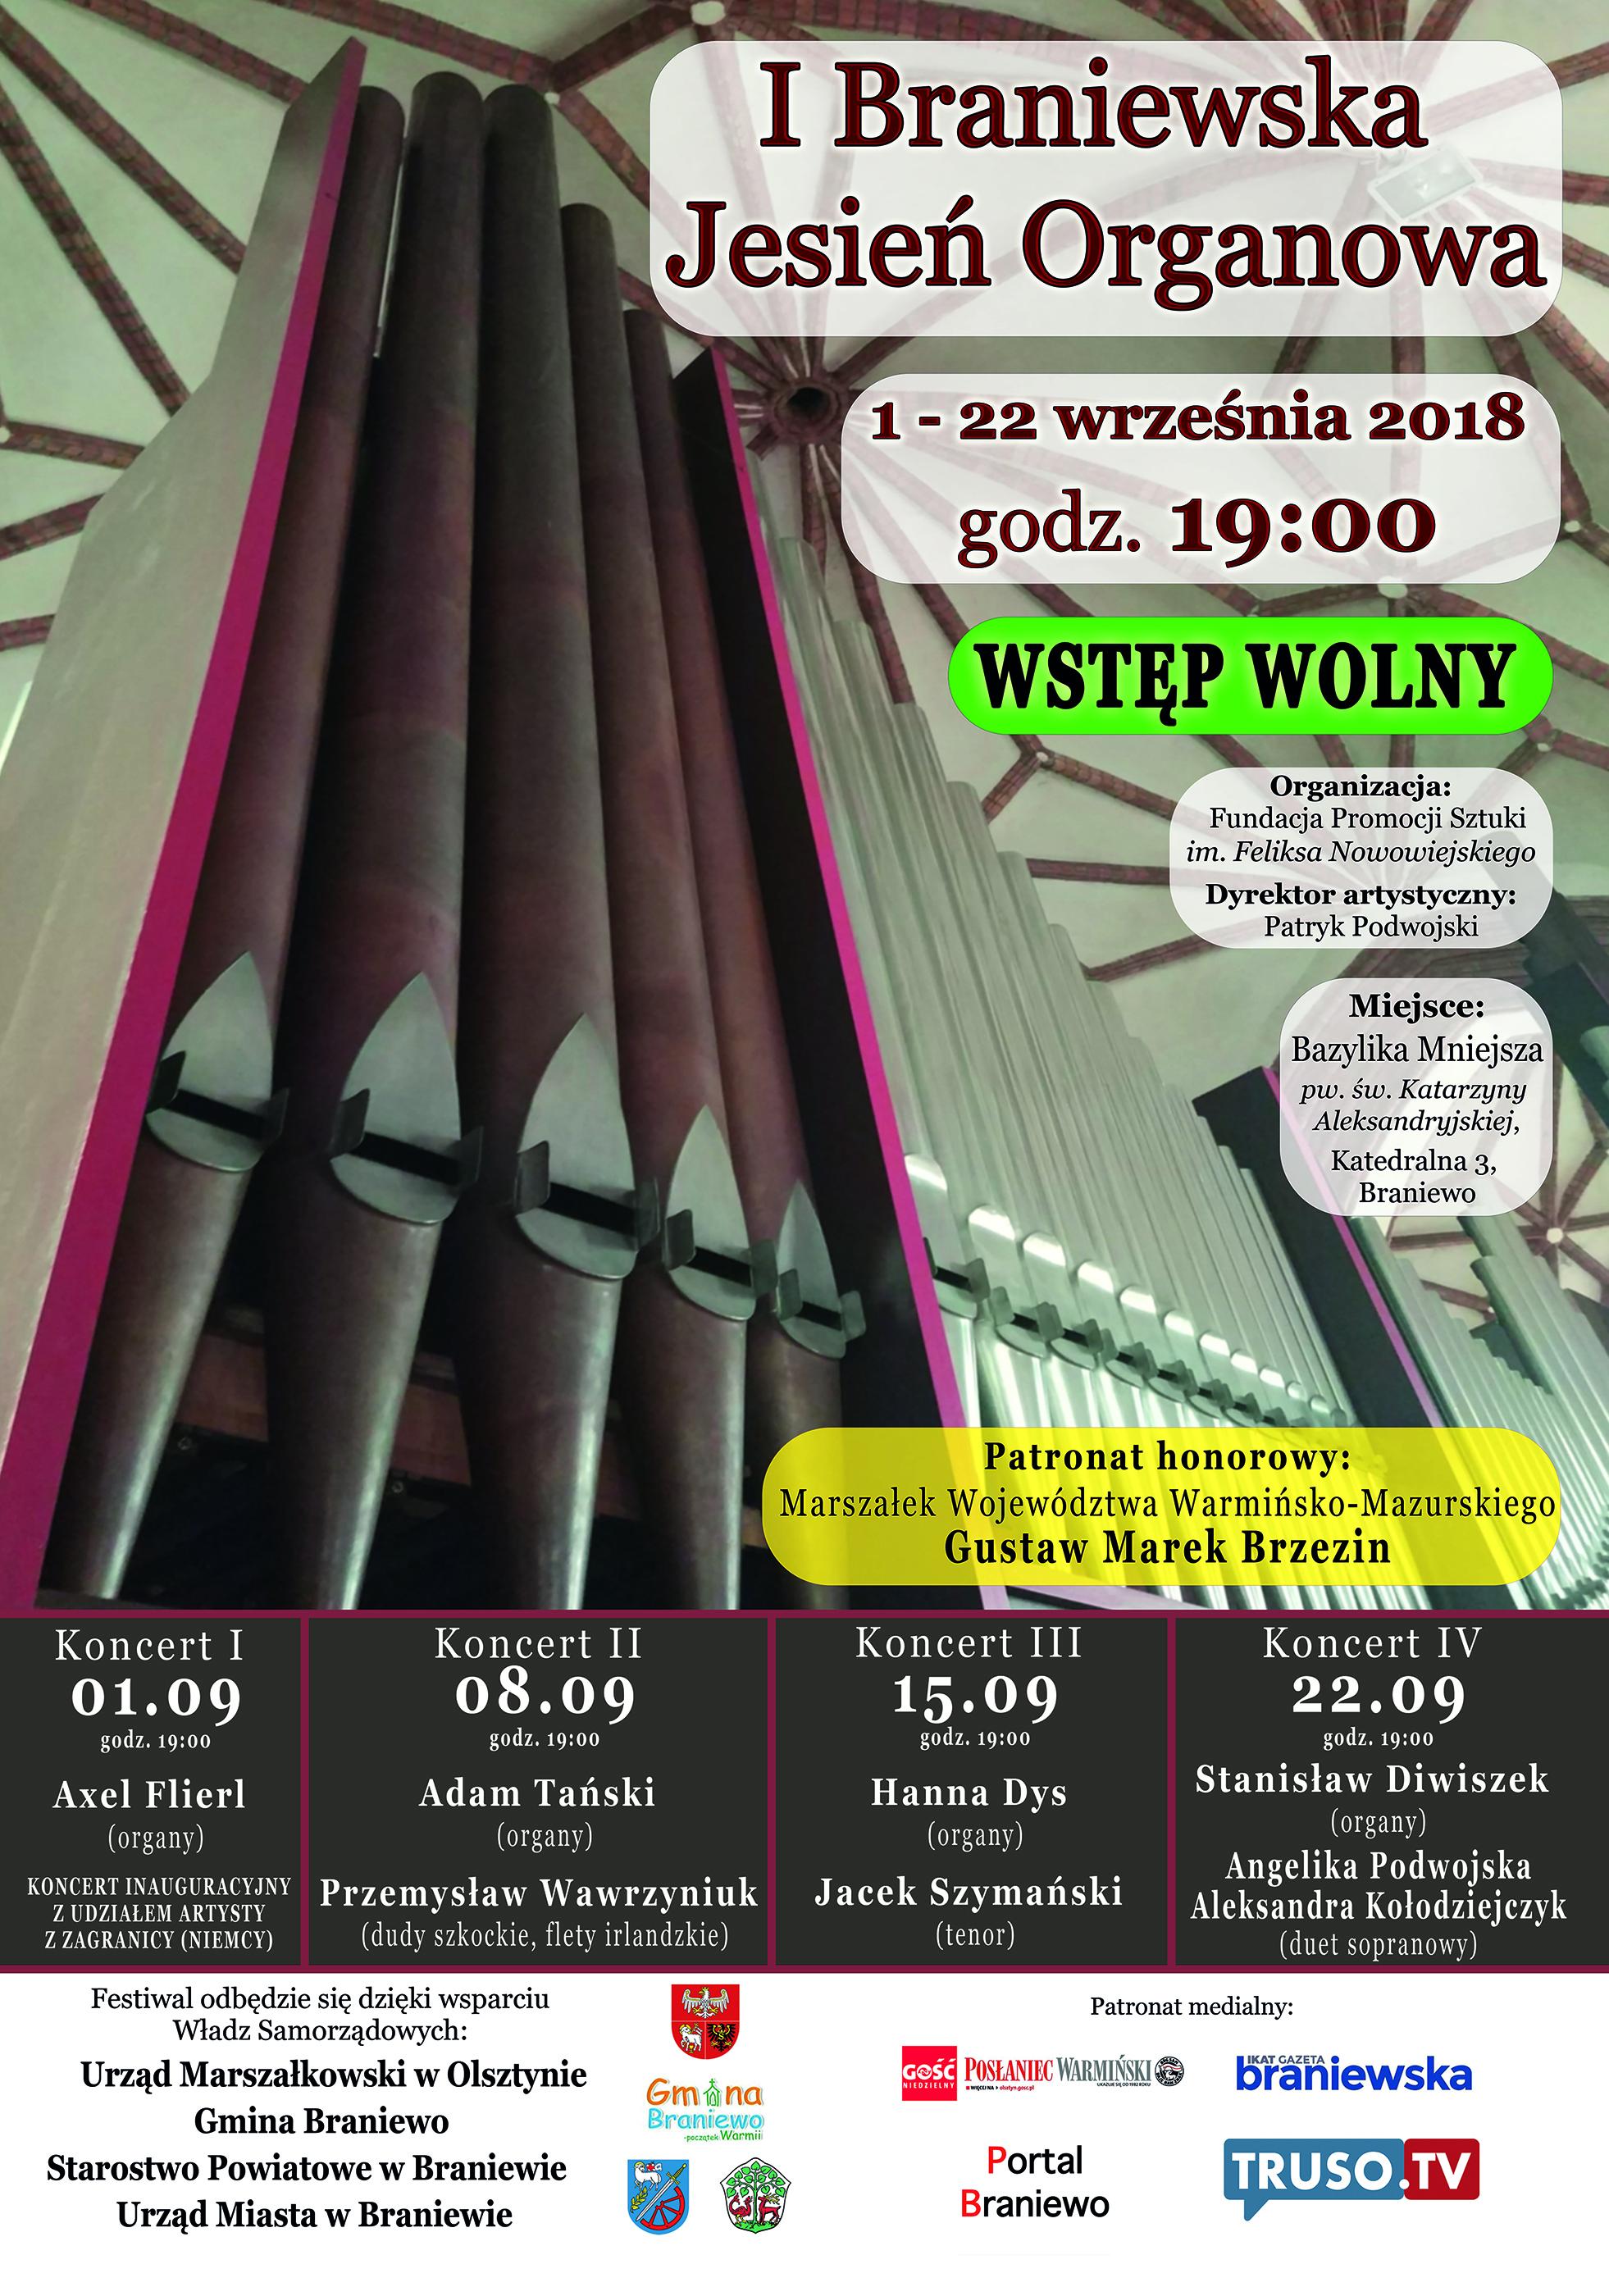 http://m.wm.pl/2018/08/orig/plakat-aktualny-489681.jpg